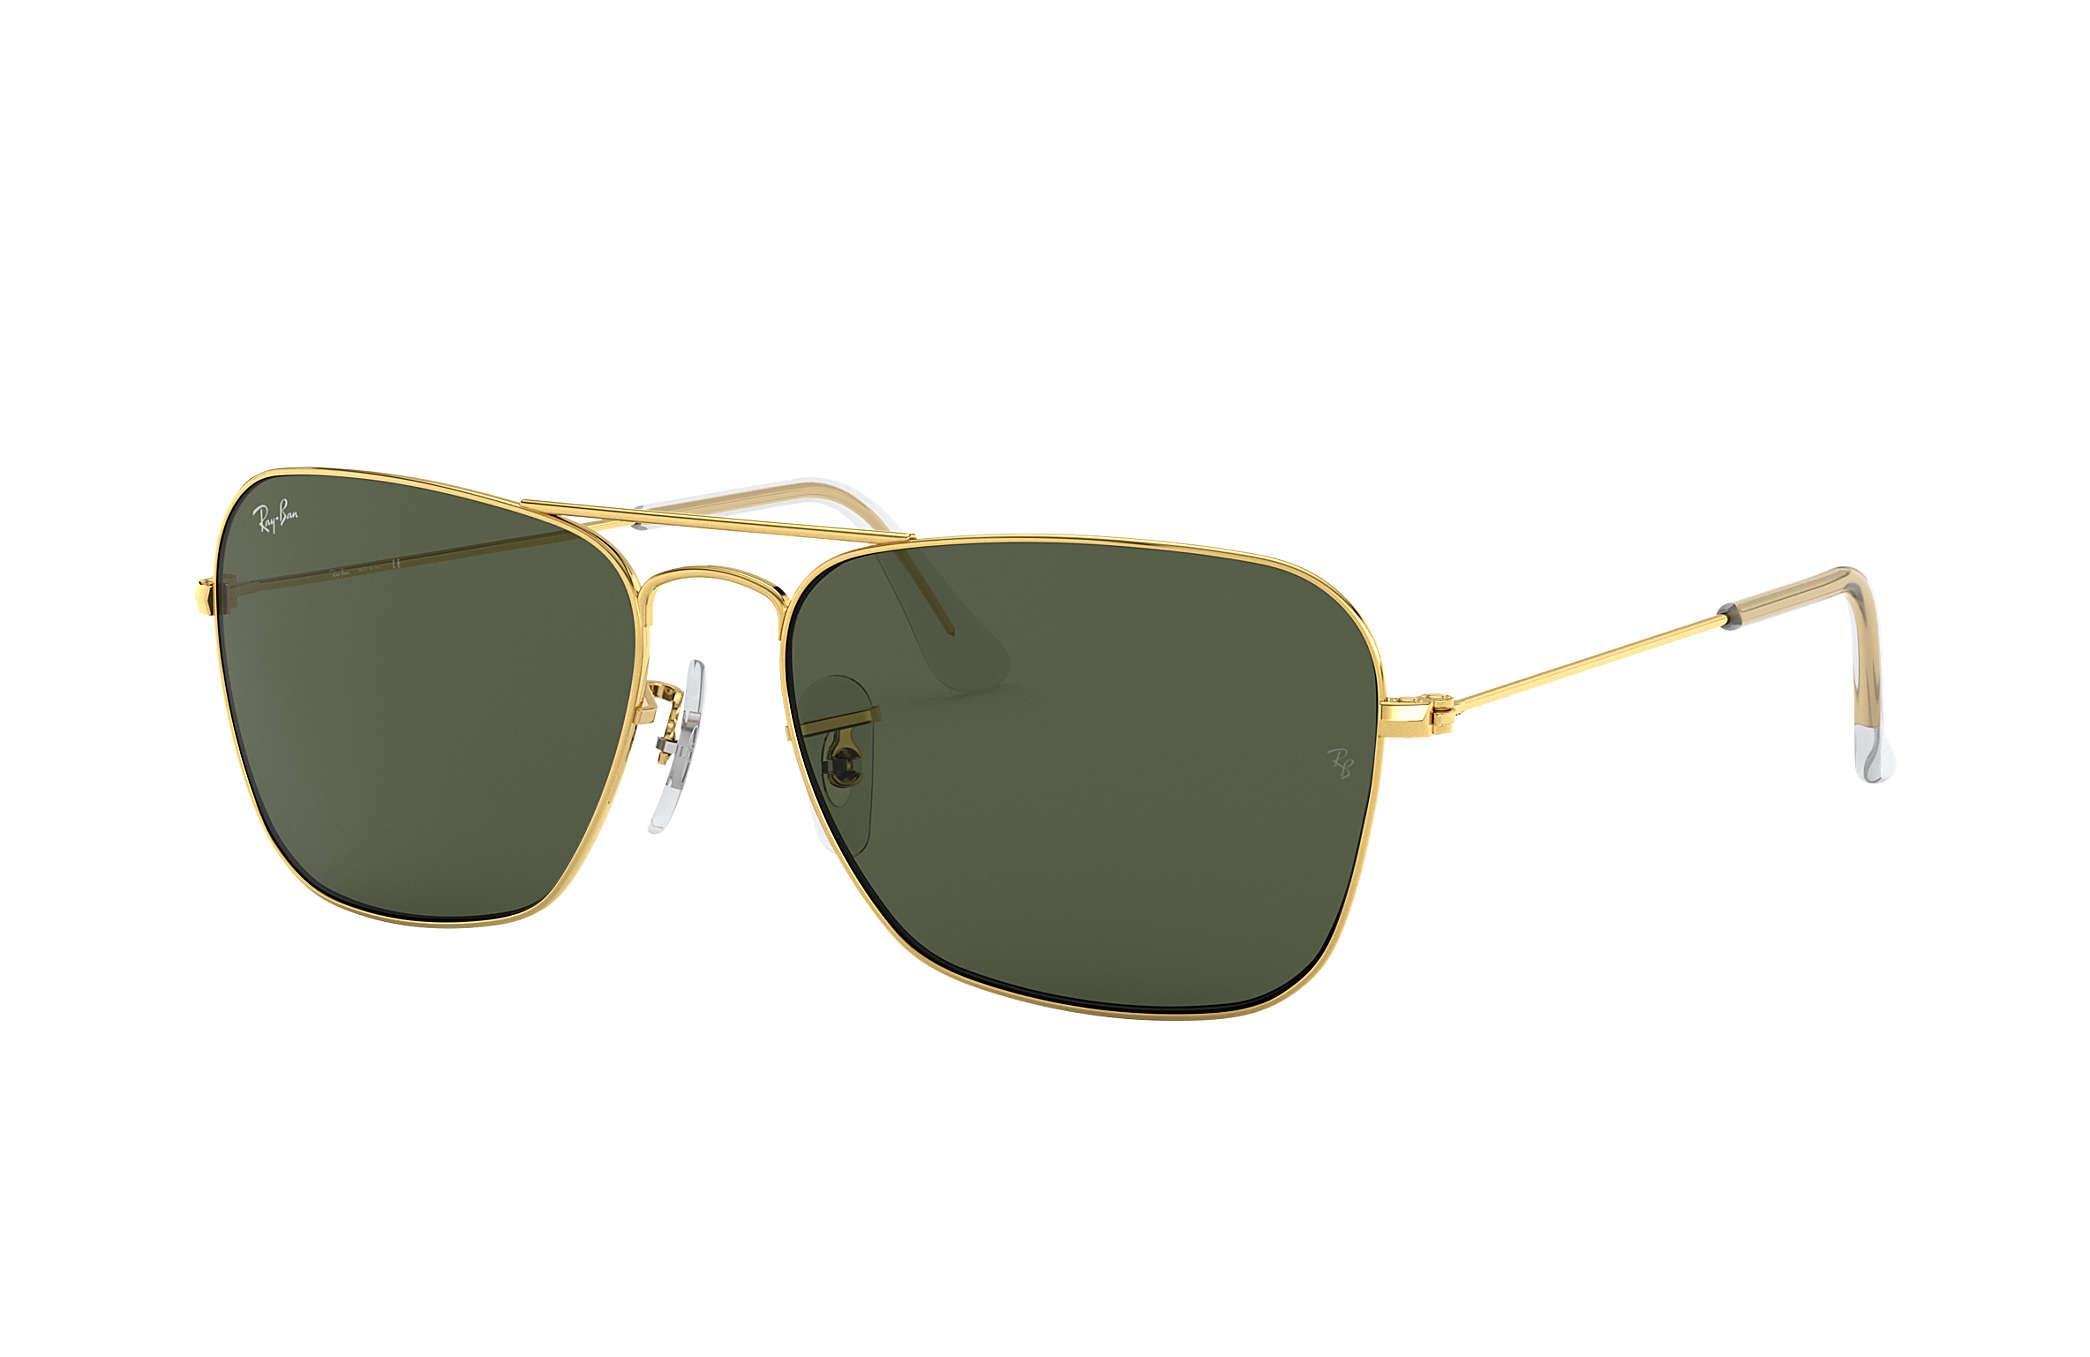 Ray-Ban Caravan RB3136 Gold - Metal - Green Lenses - 0RB313600155 ... 67fe96cf72